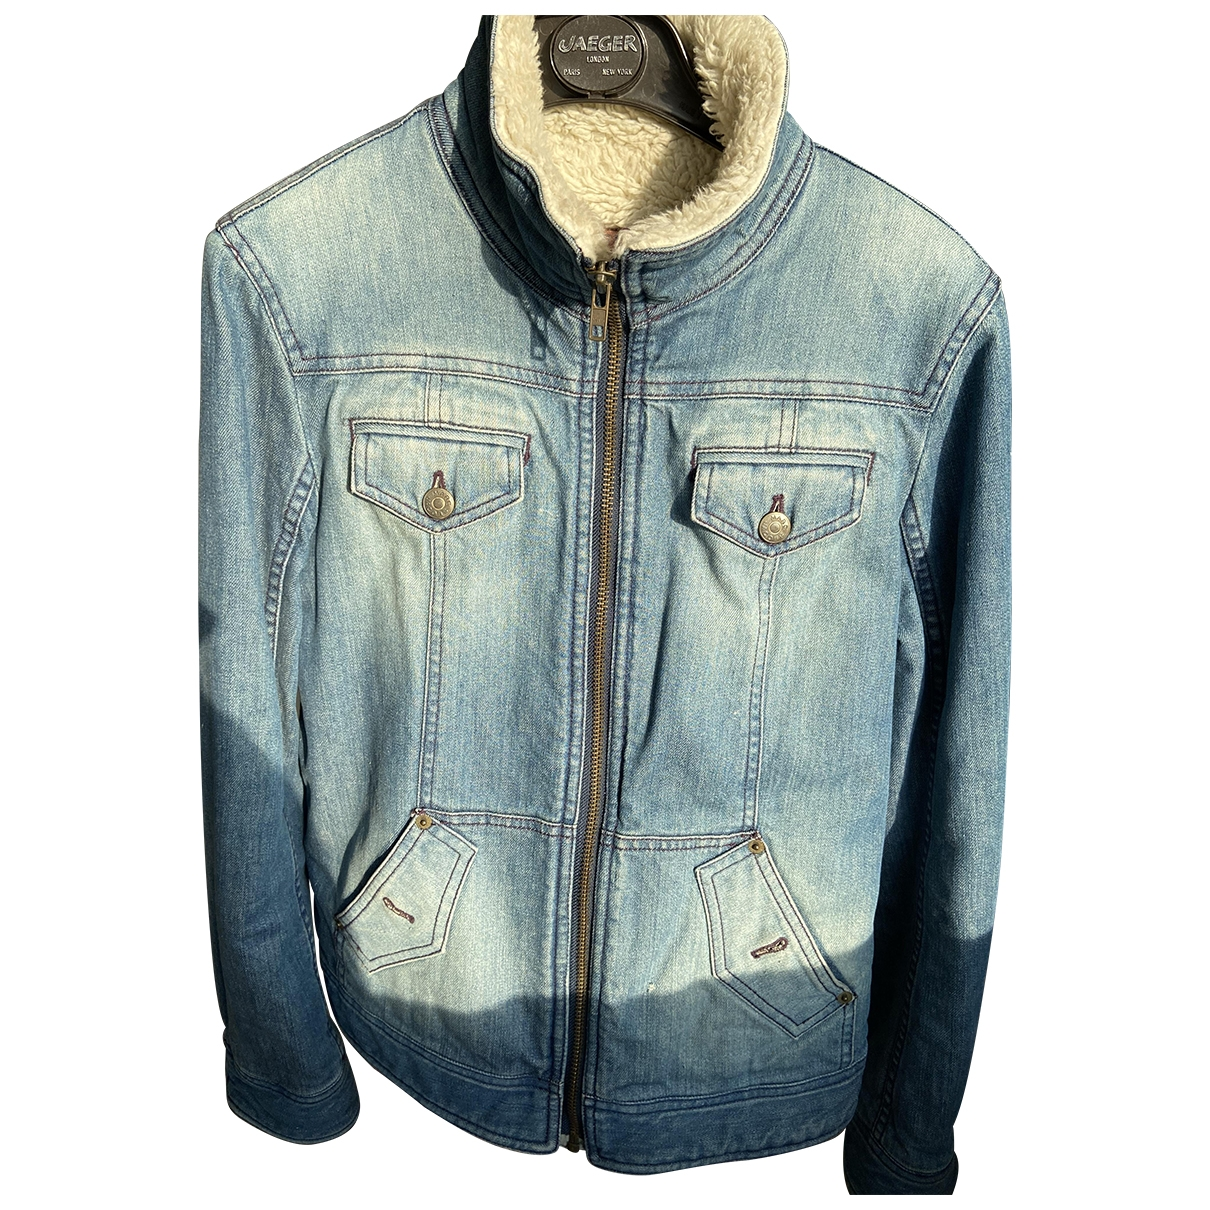 Marc By Marc Jacobs \N Blue Denim - Jeans jacket for Women 4 US